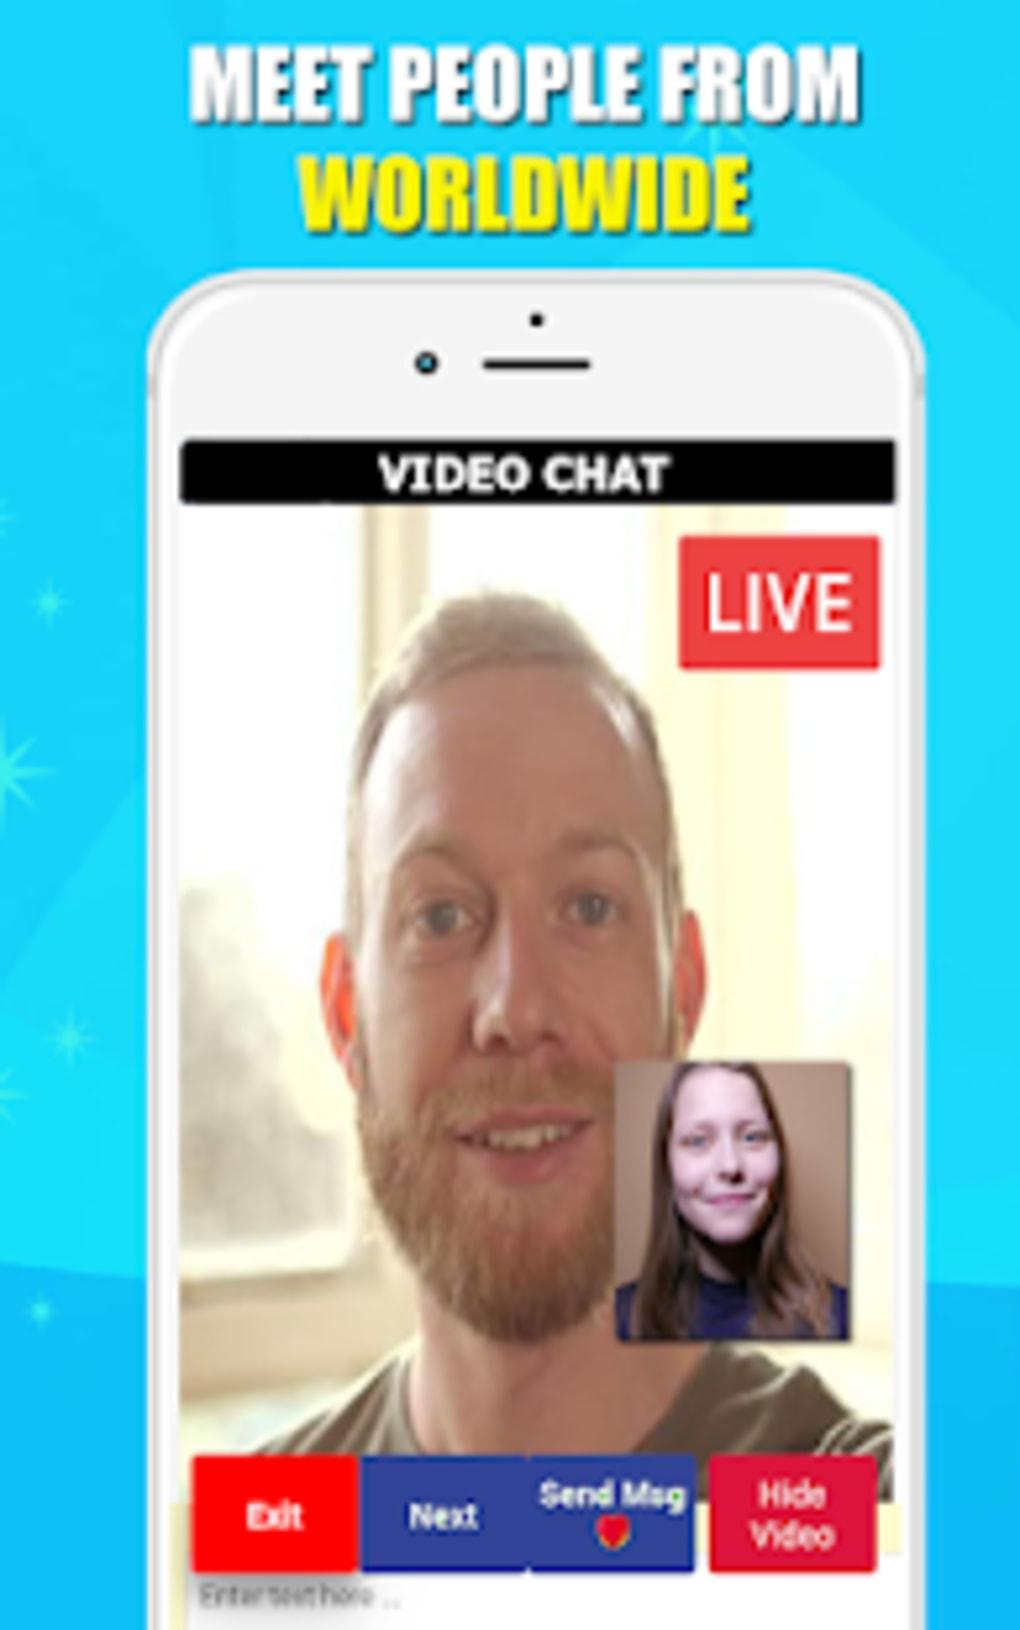 Video chat random